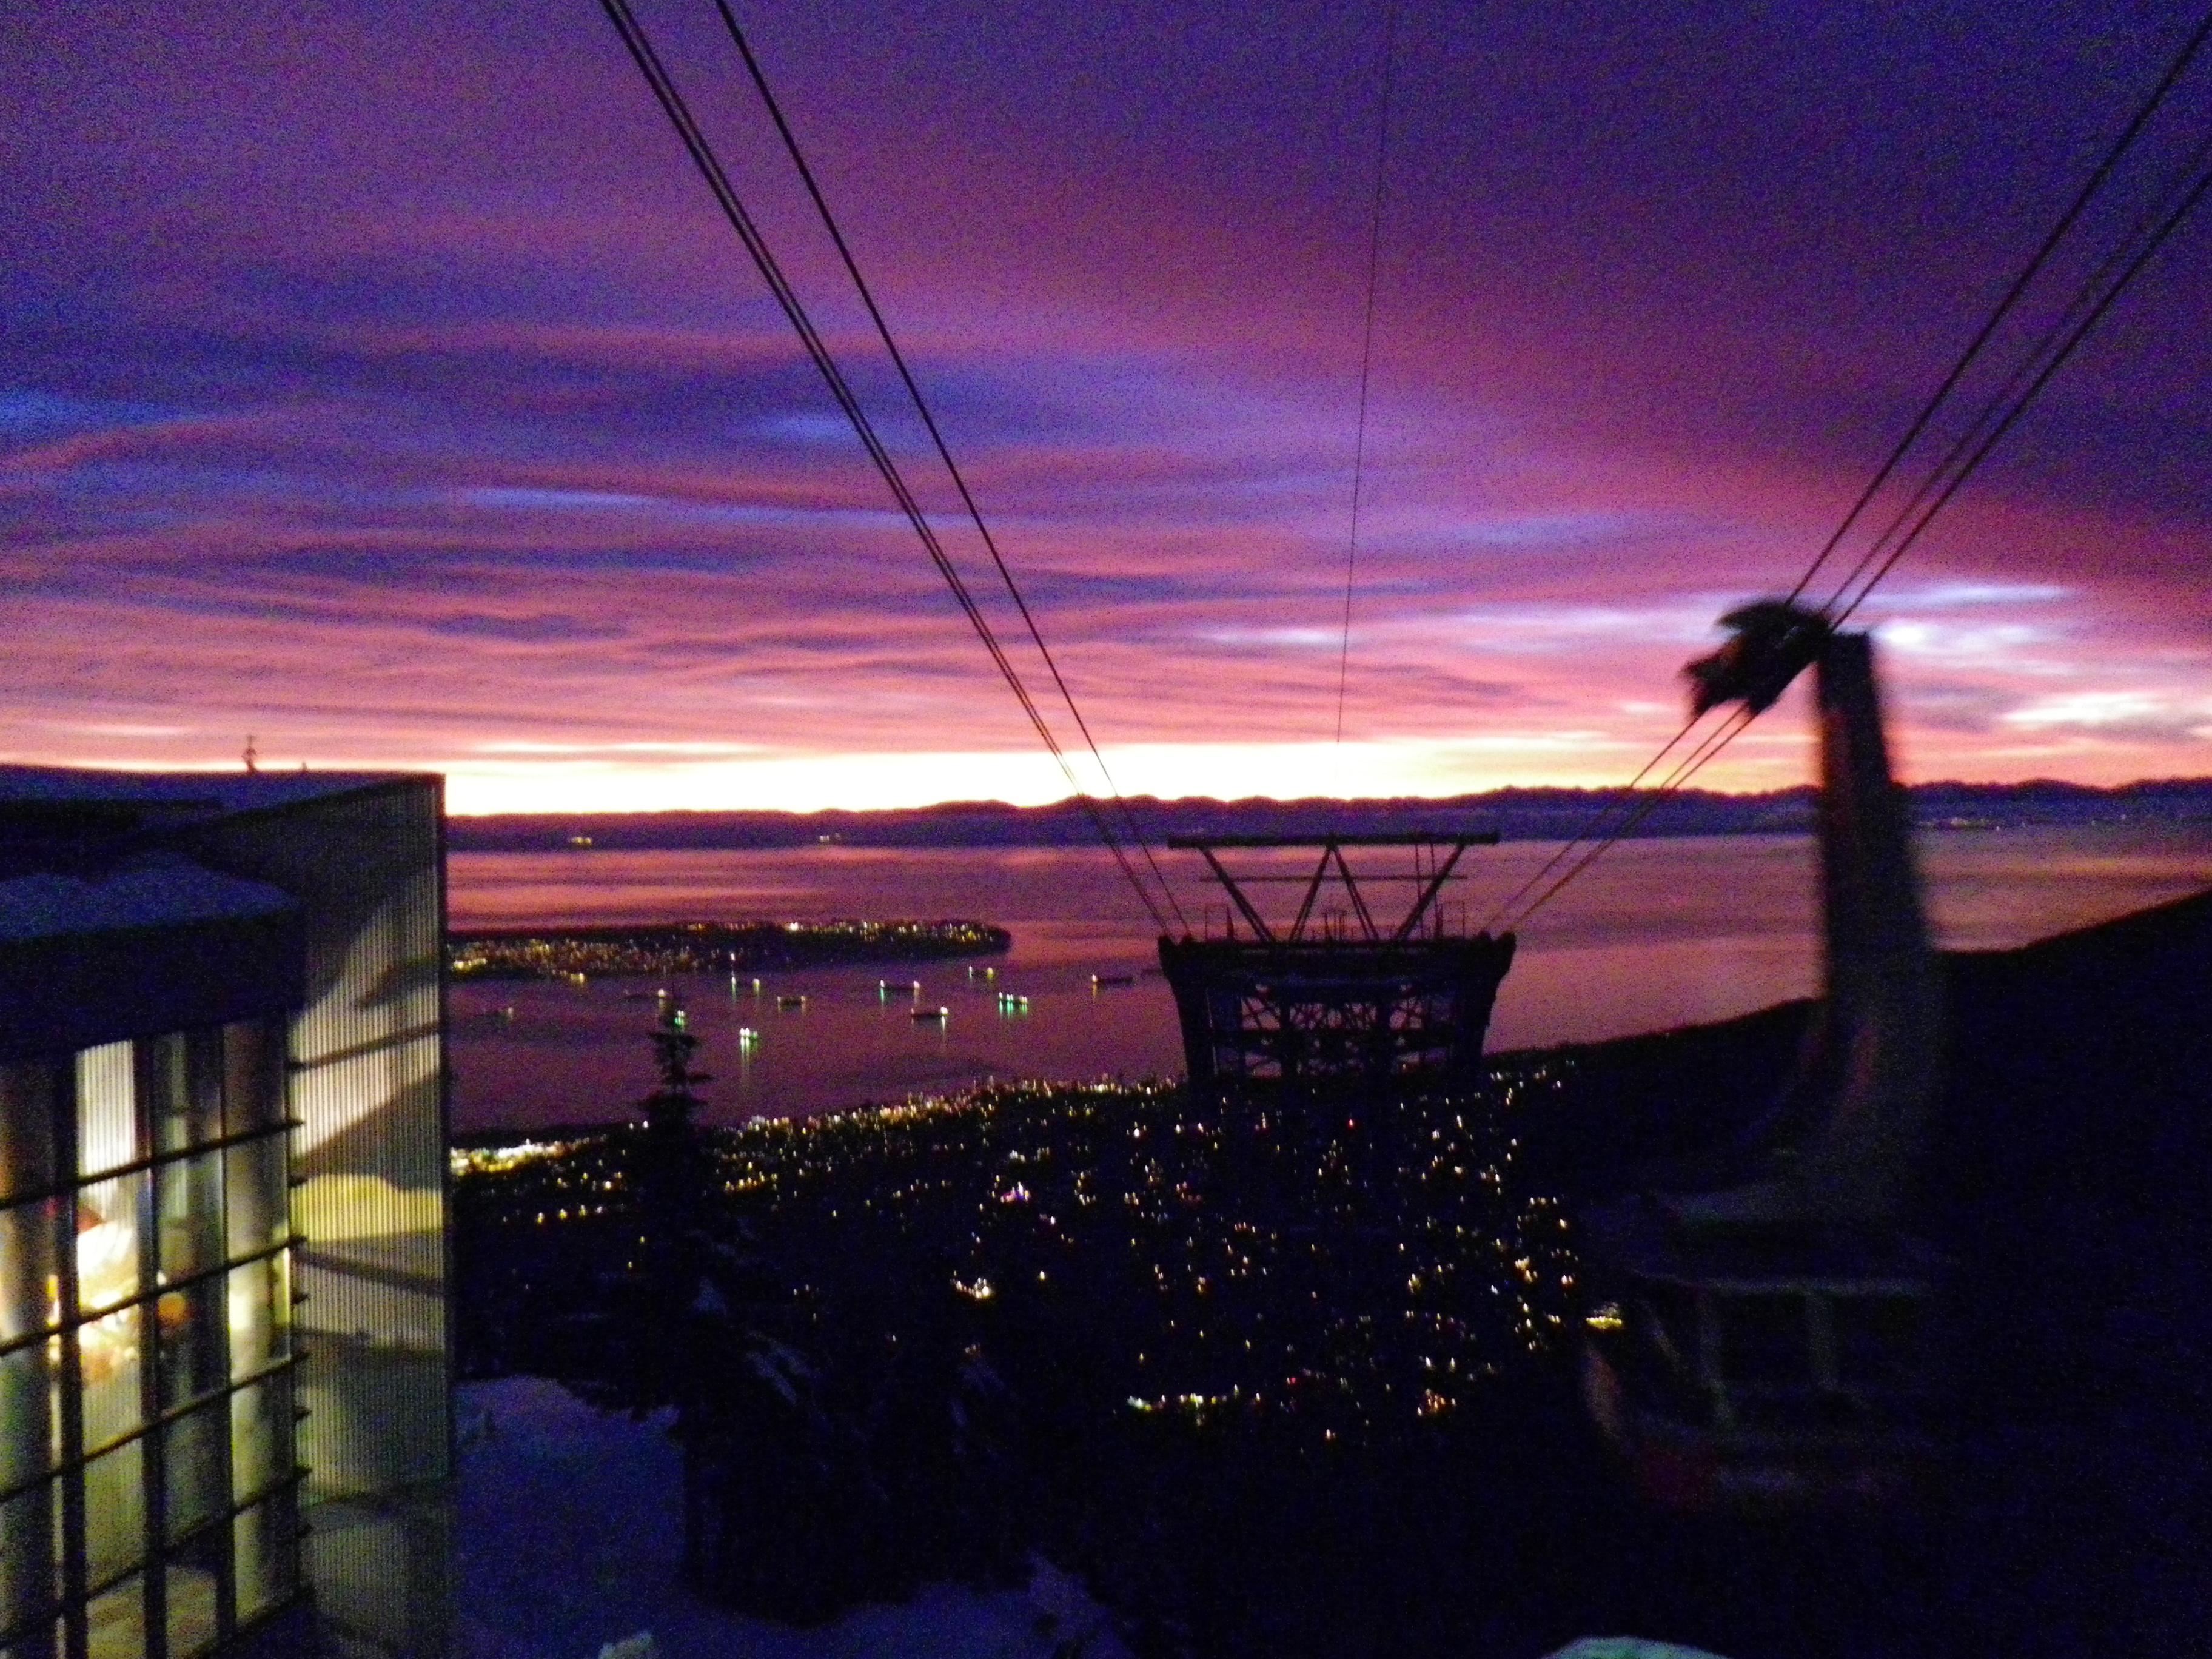 Dope sunset